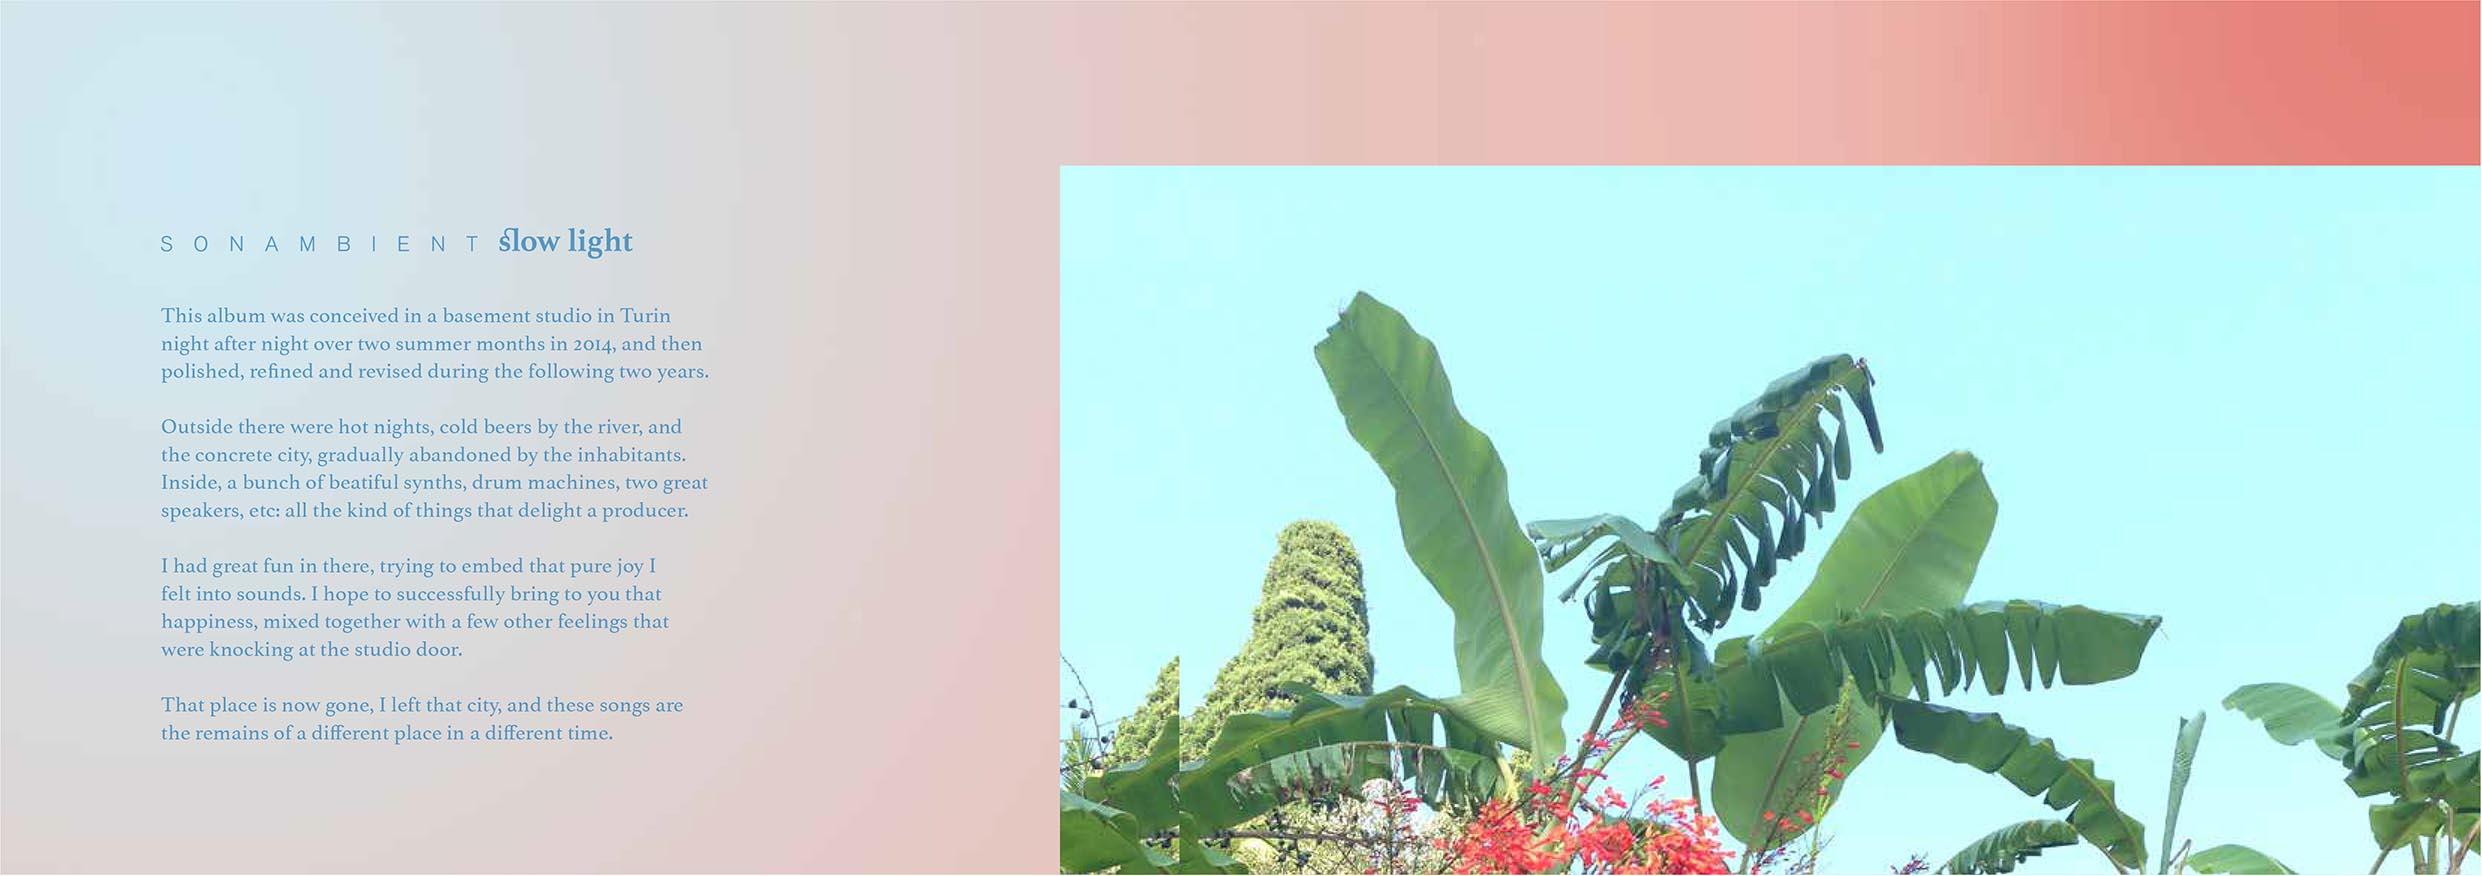 SONAMBIENT SLOW LIGHT ALBUM ARTWORK 01